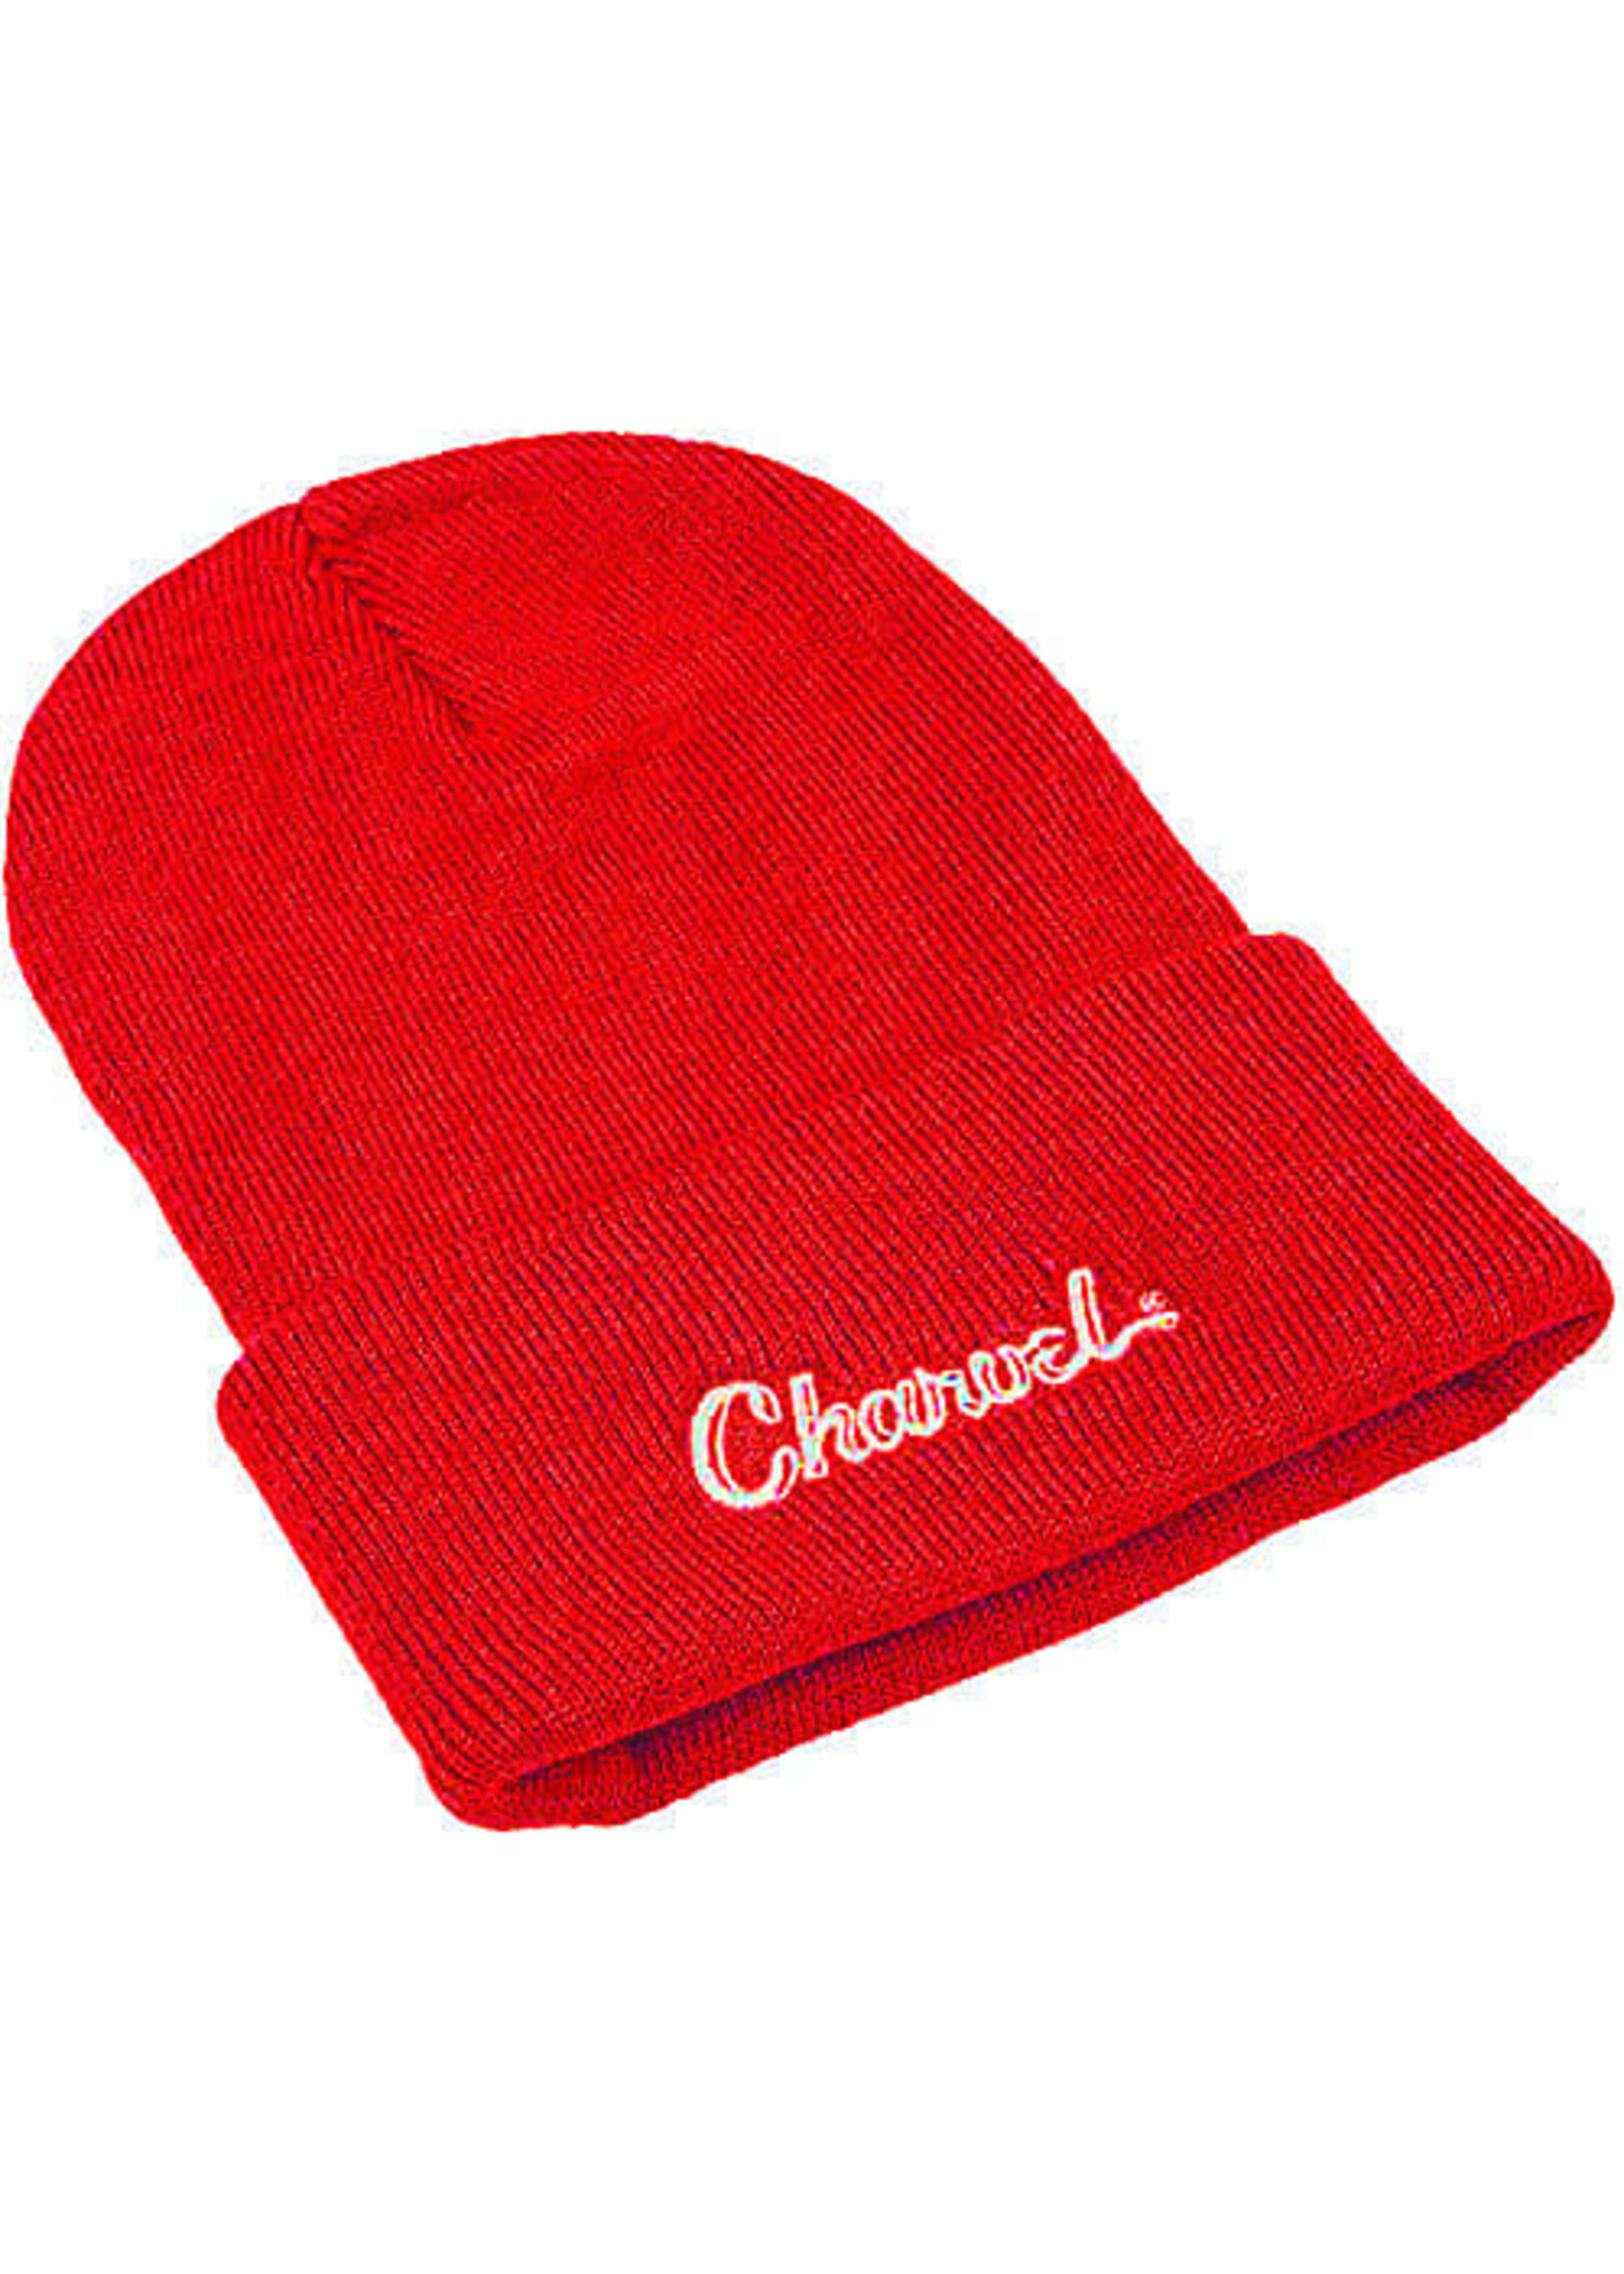 Charvel Charvel Toothpaste Logo Beanie - Red